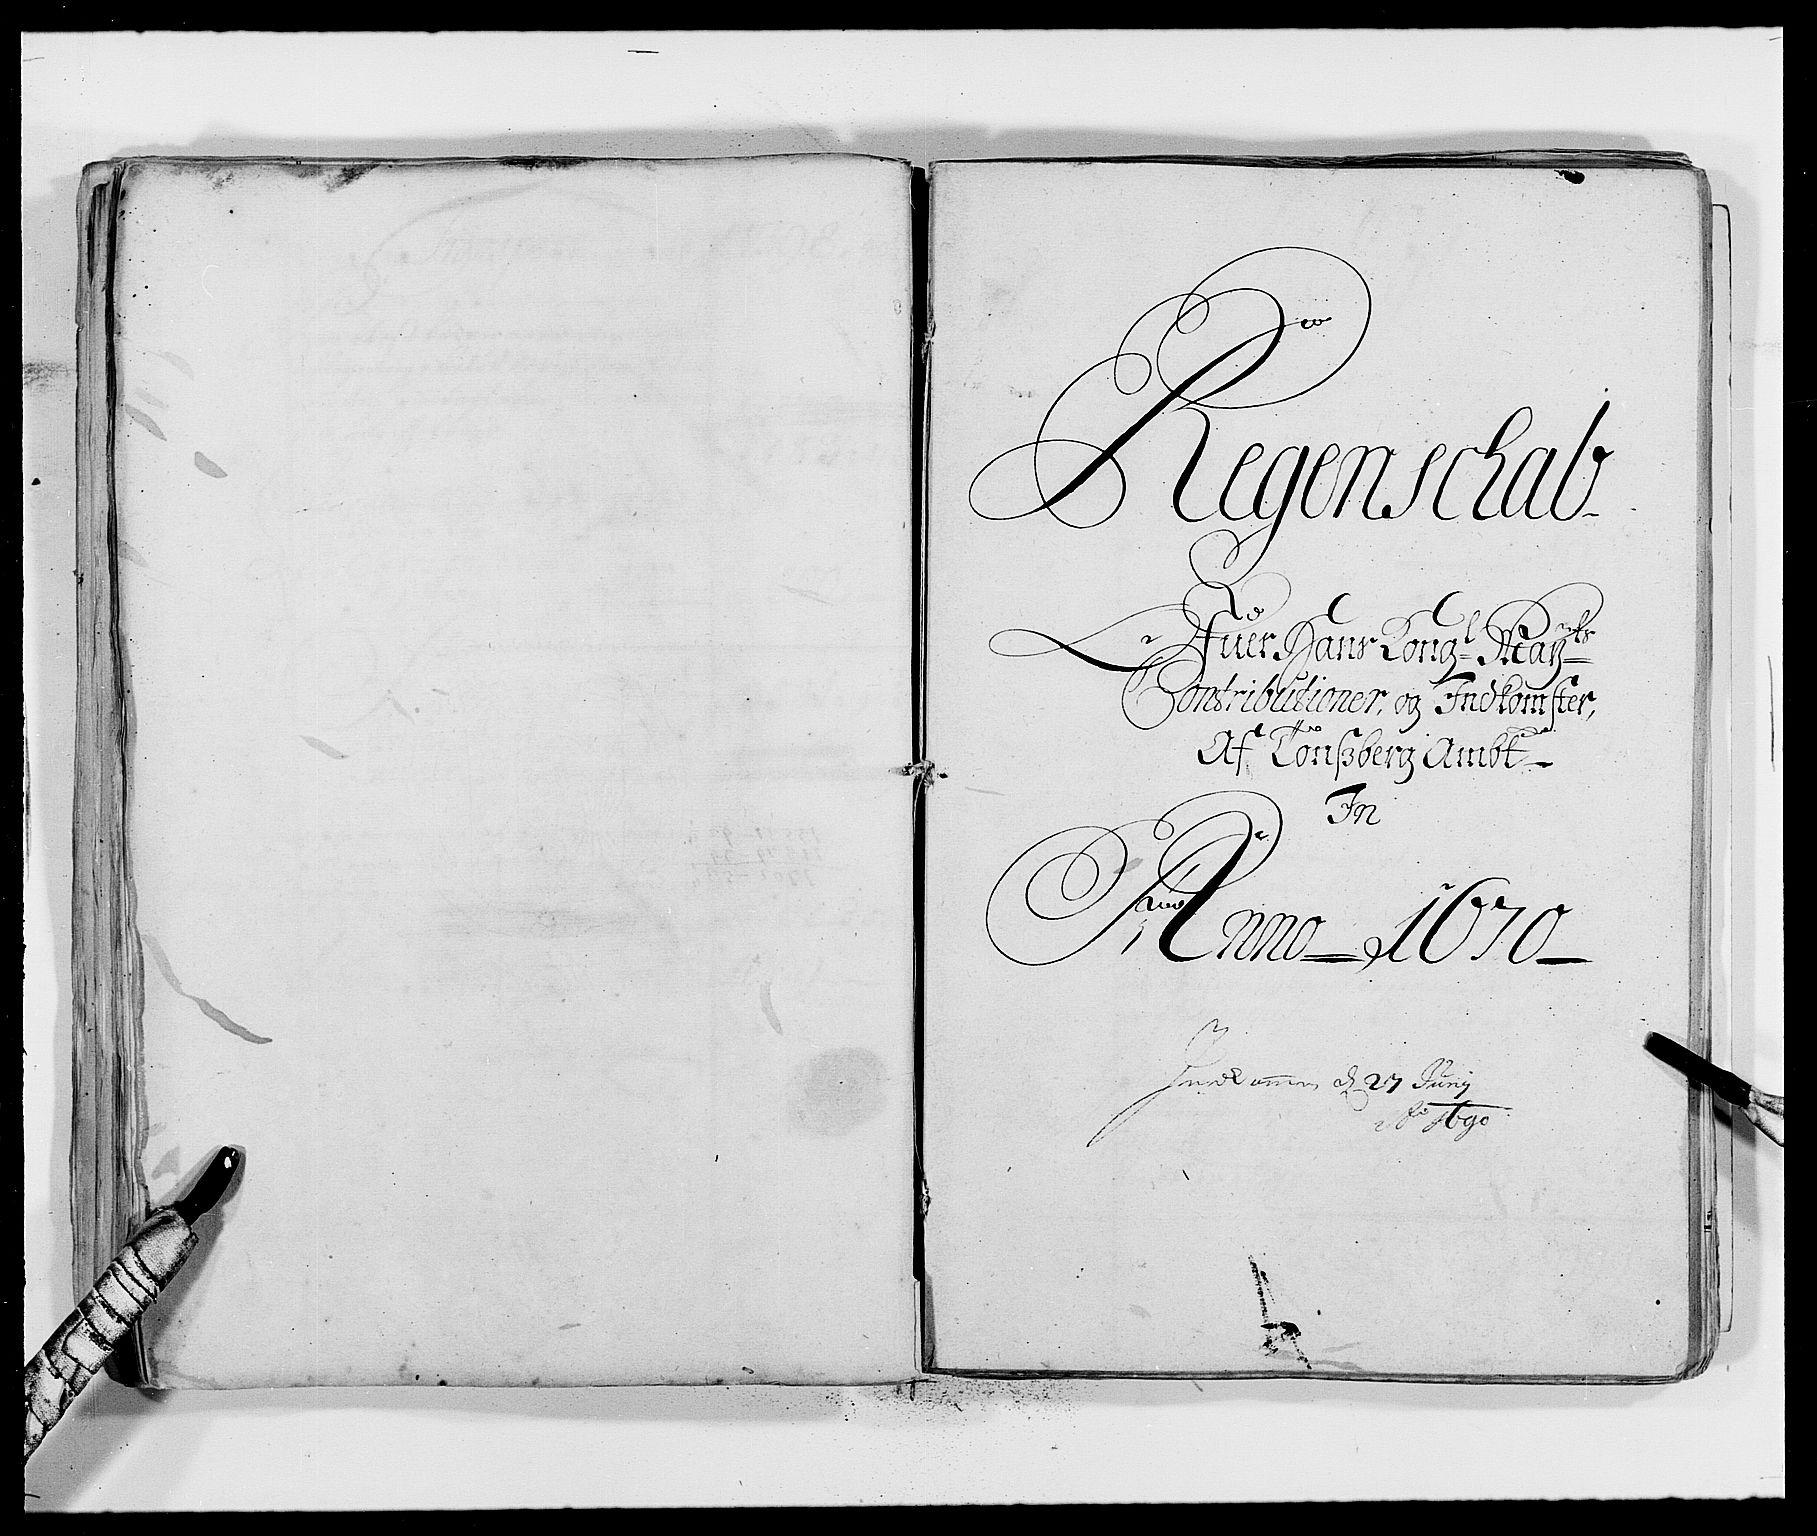 RA, Rentekammeret inntil 1814, Reviderte regnskaper, Fogderegnskap, R32/L1839: Fogderegnskap Jarlsberg grevskap, 1664-1673, s. 89